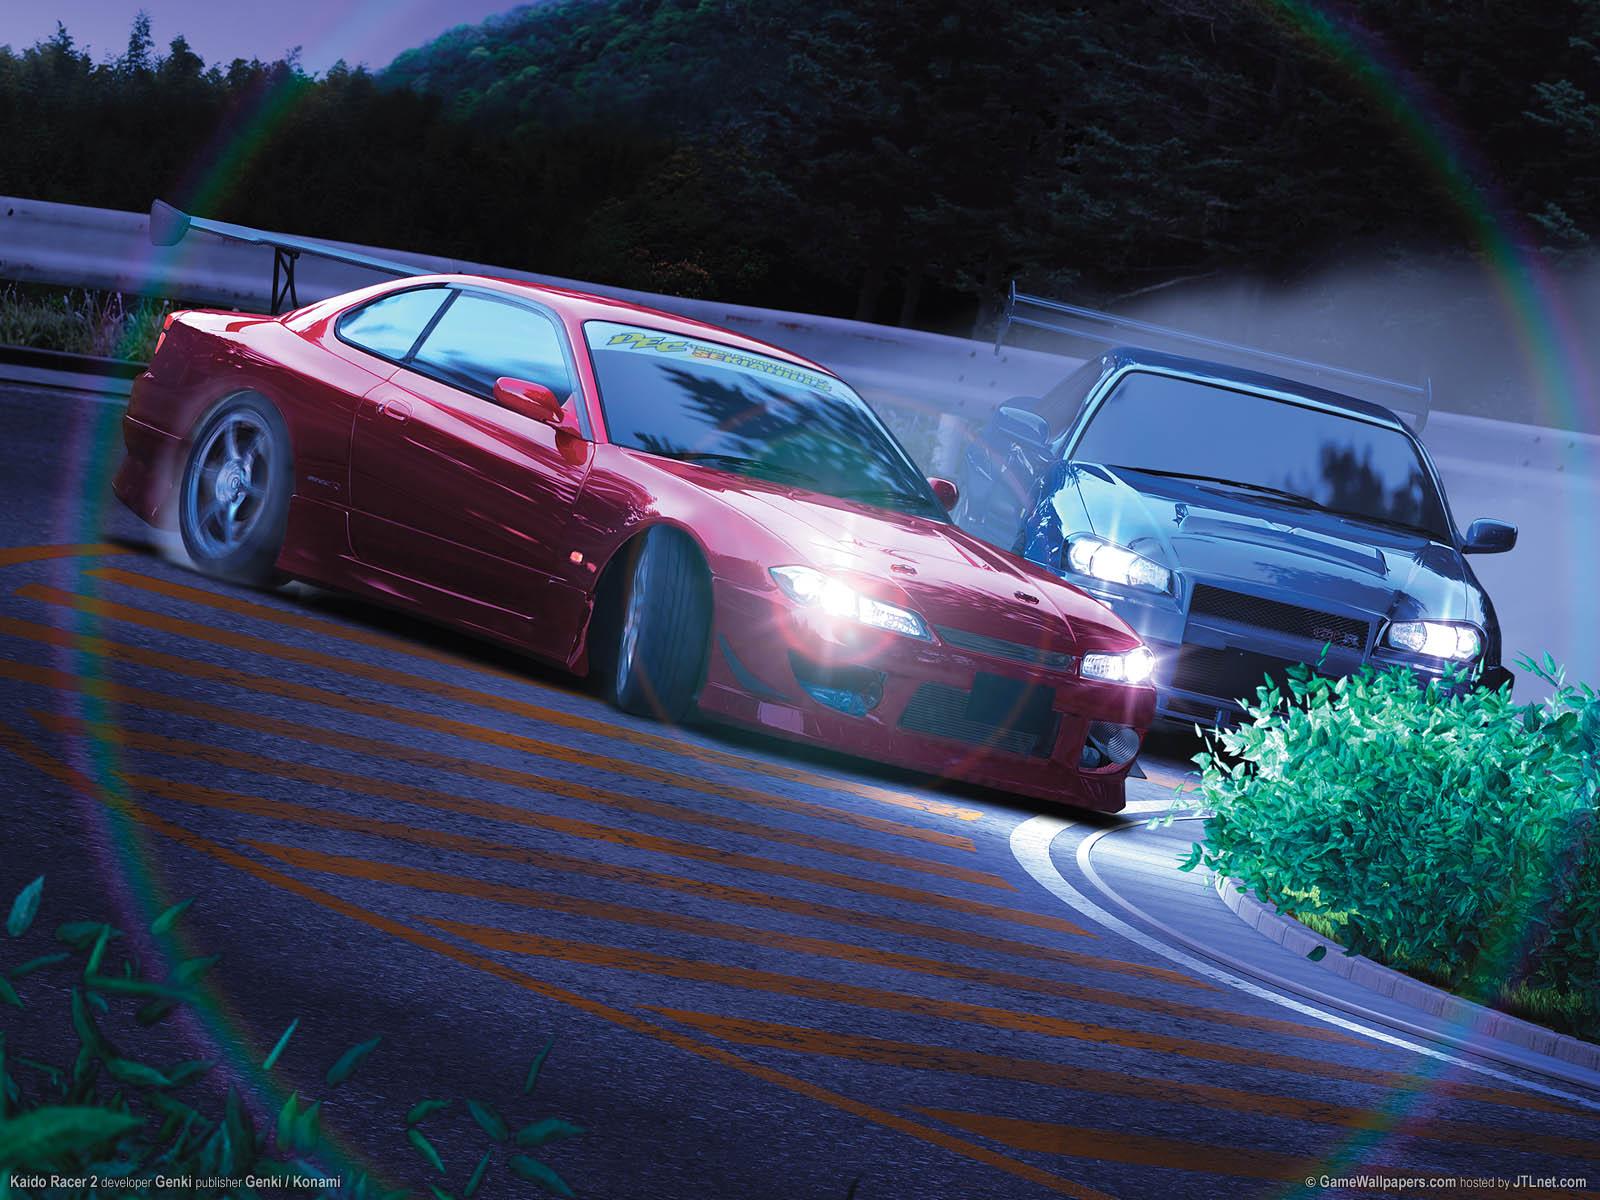 Kaido Racer 2νmmer=01 achtergrond  1600x1200